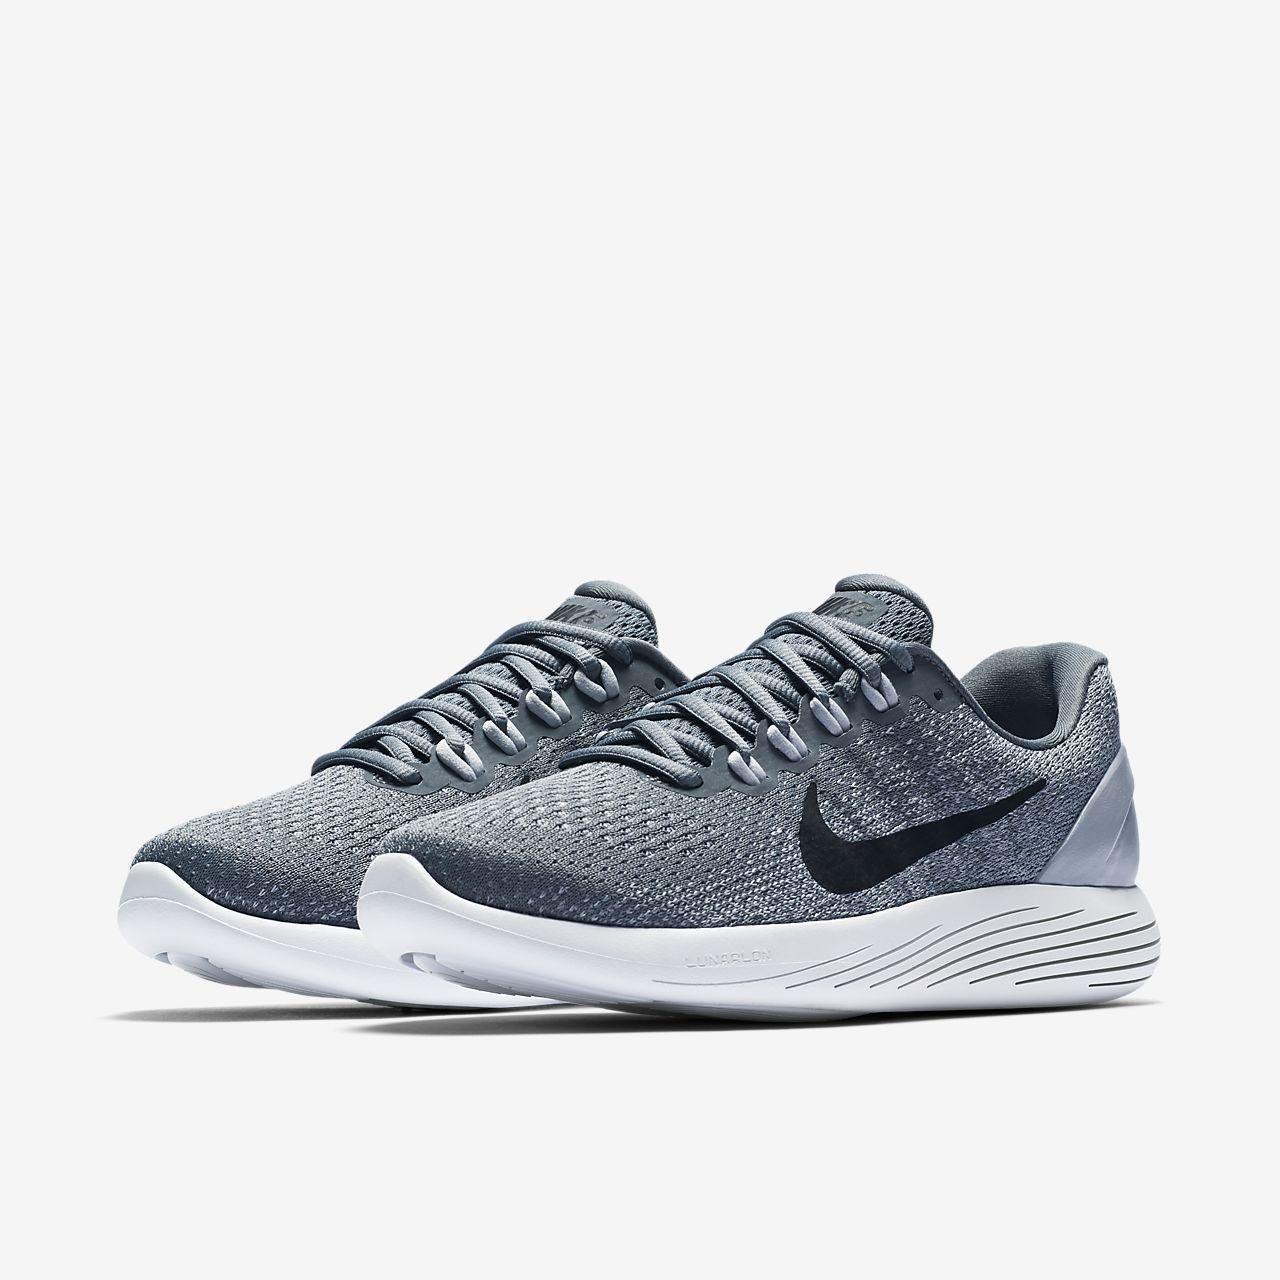 new style 254db 7feab Nike LunarGlide 9 Women's Running Shoe